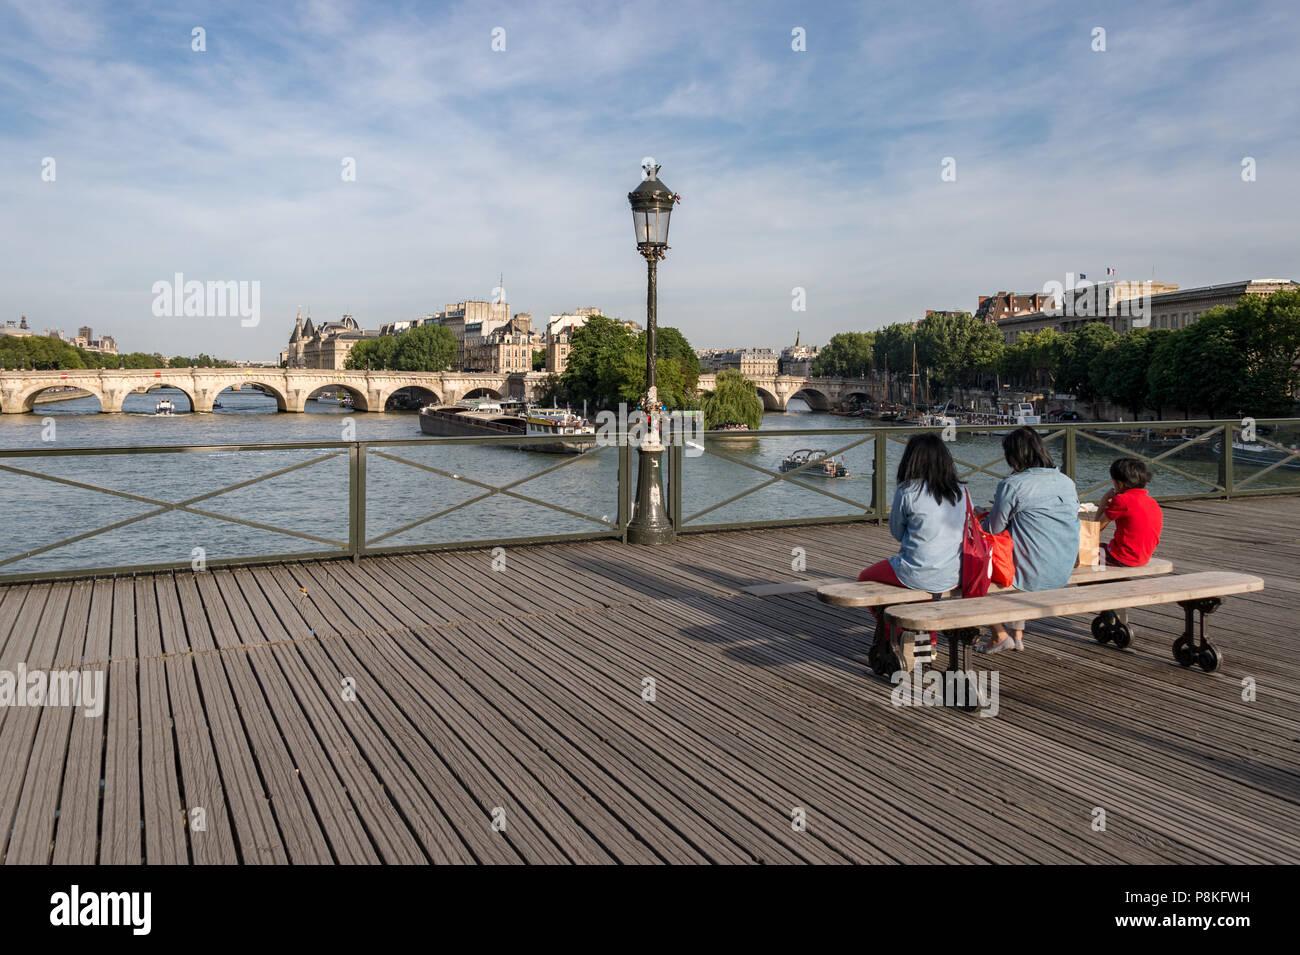 Paris, 24 June 2018: Tourists enjoying the view from Pont des Arts bridge. - Stock Image